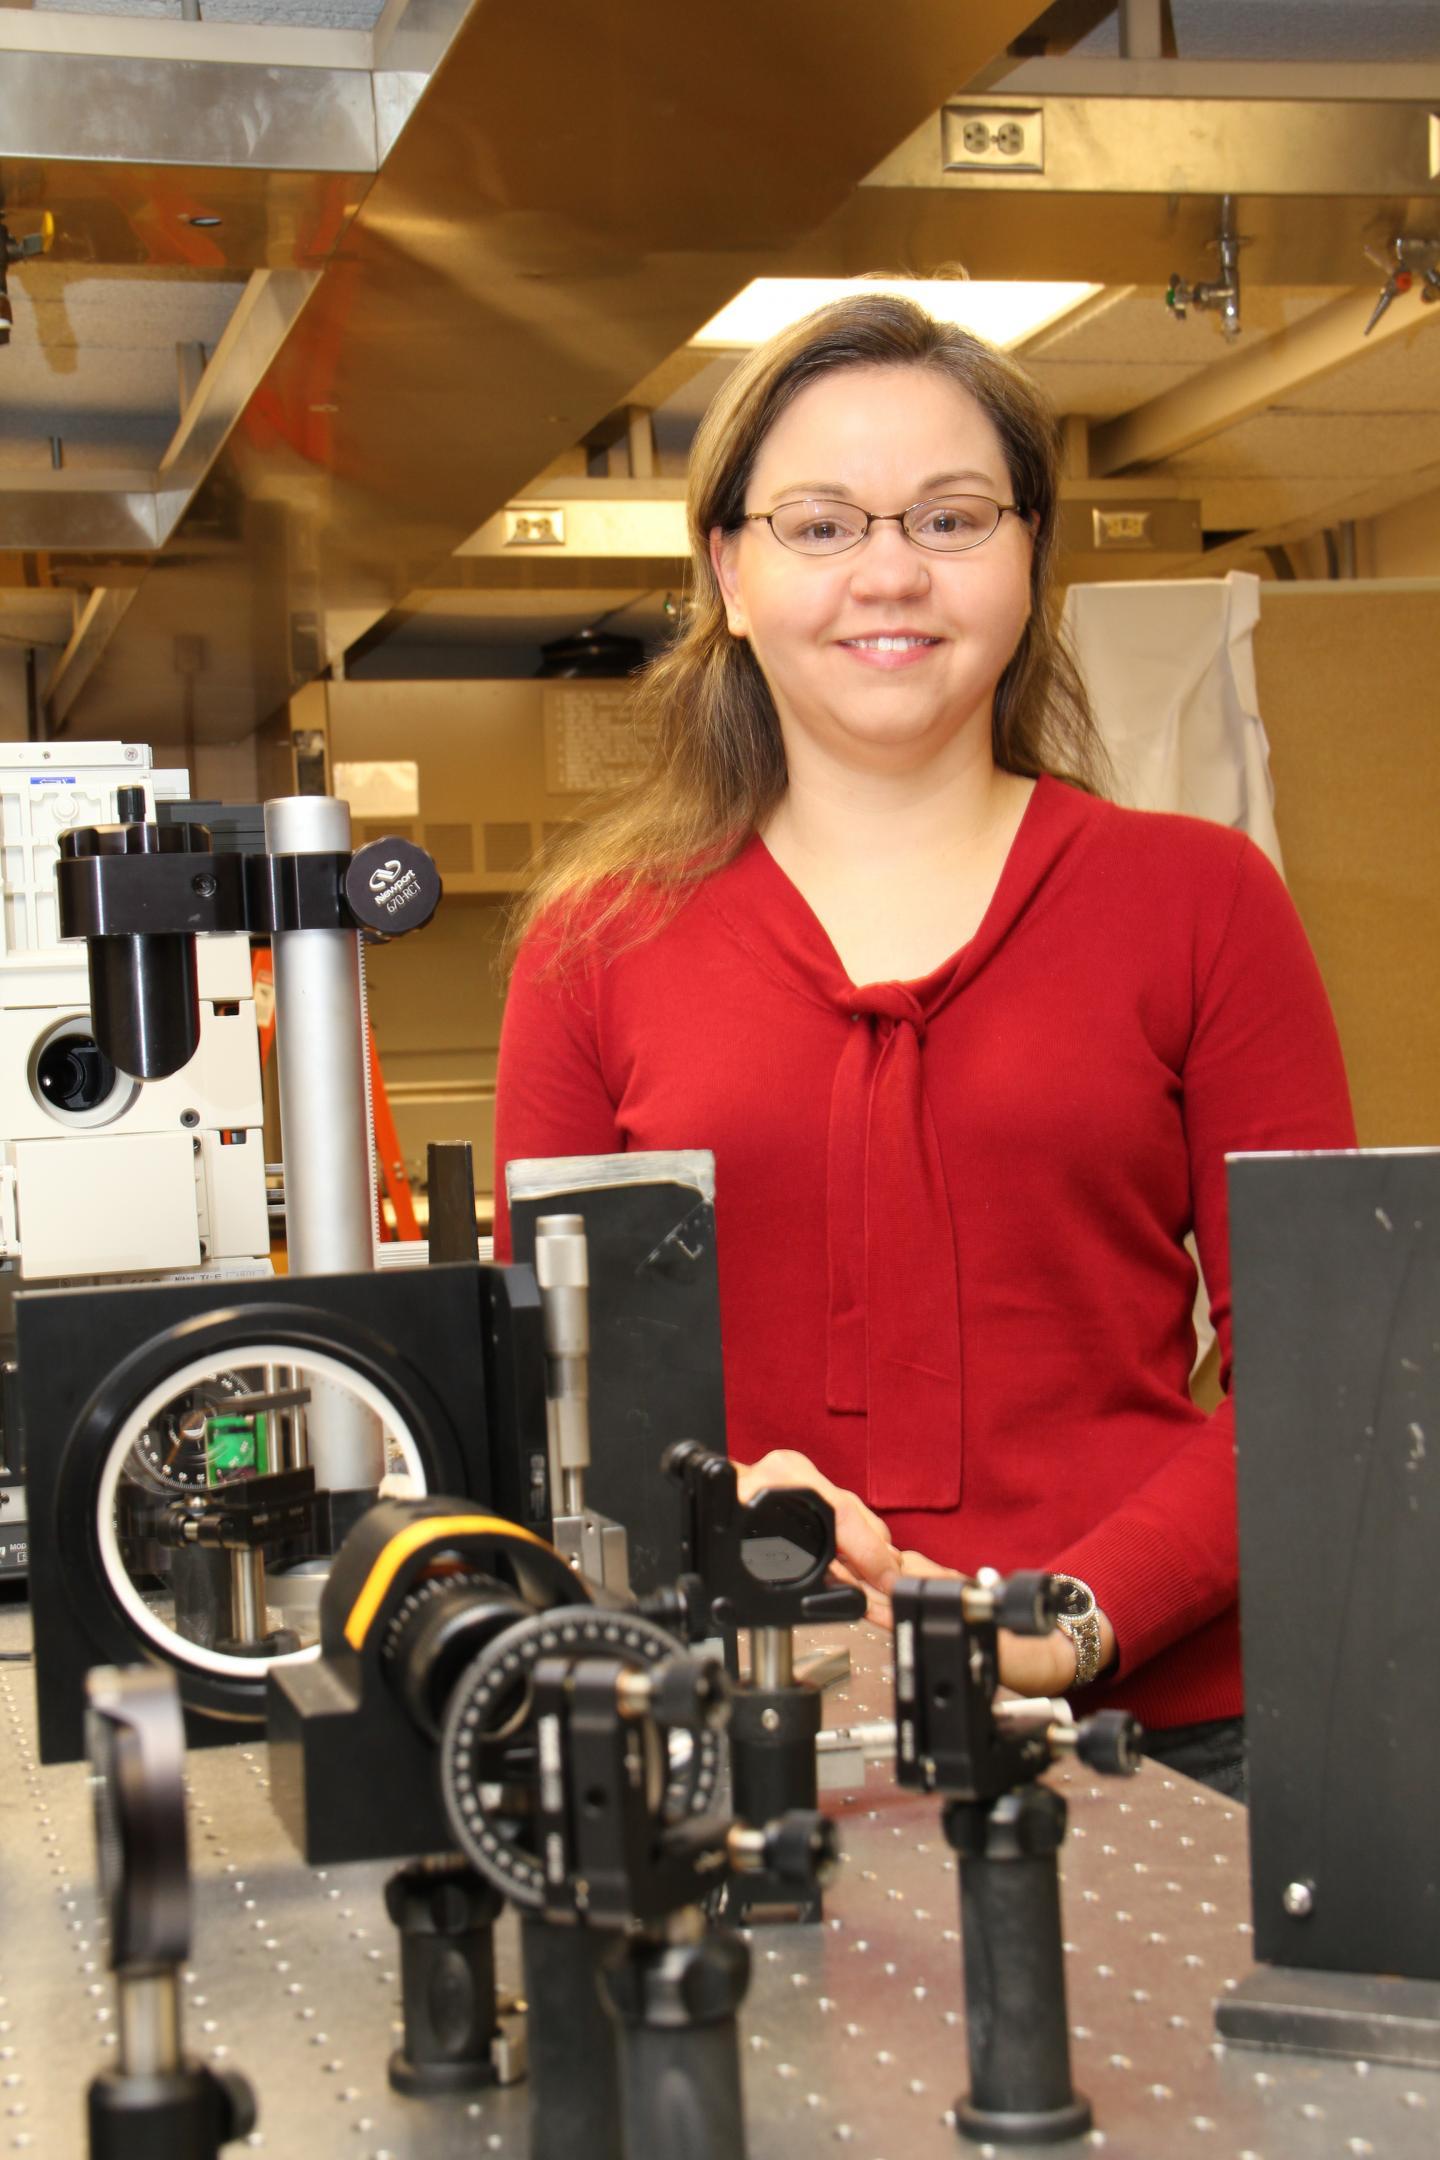 Emily Smith, DOE/Ames Laboratory